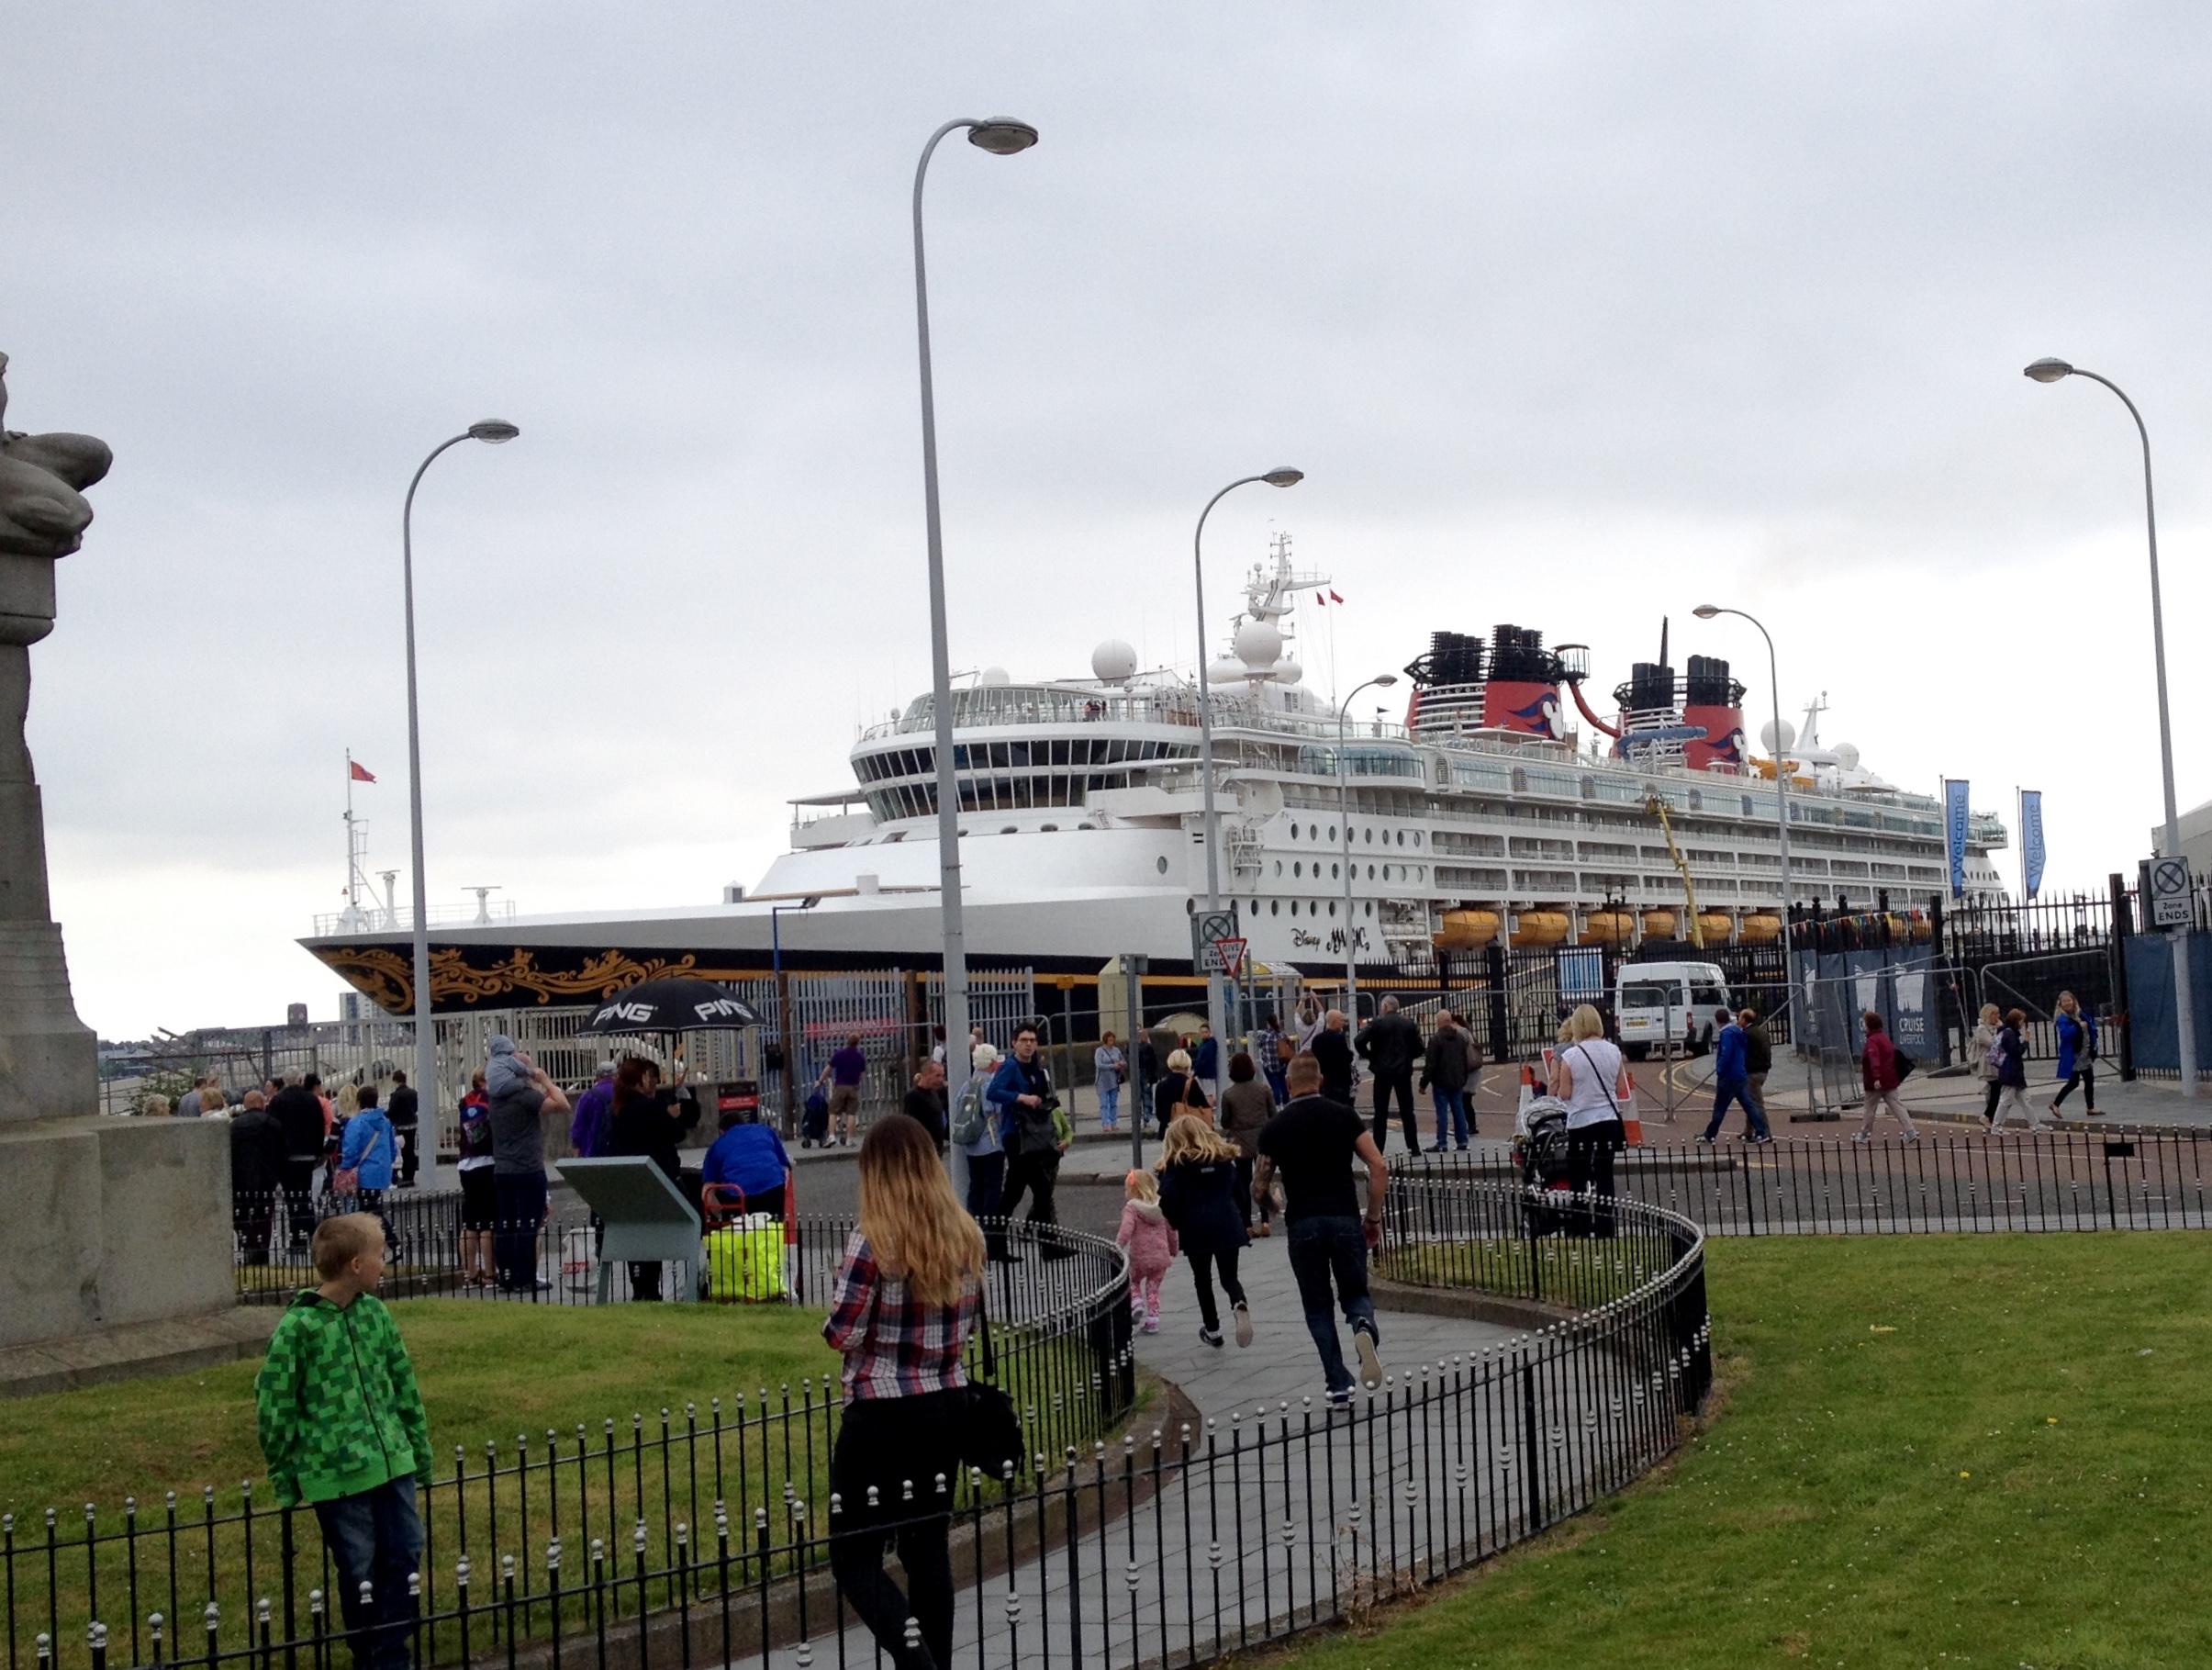 Disney MGM cruise ship at Liverpool June 2016